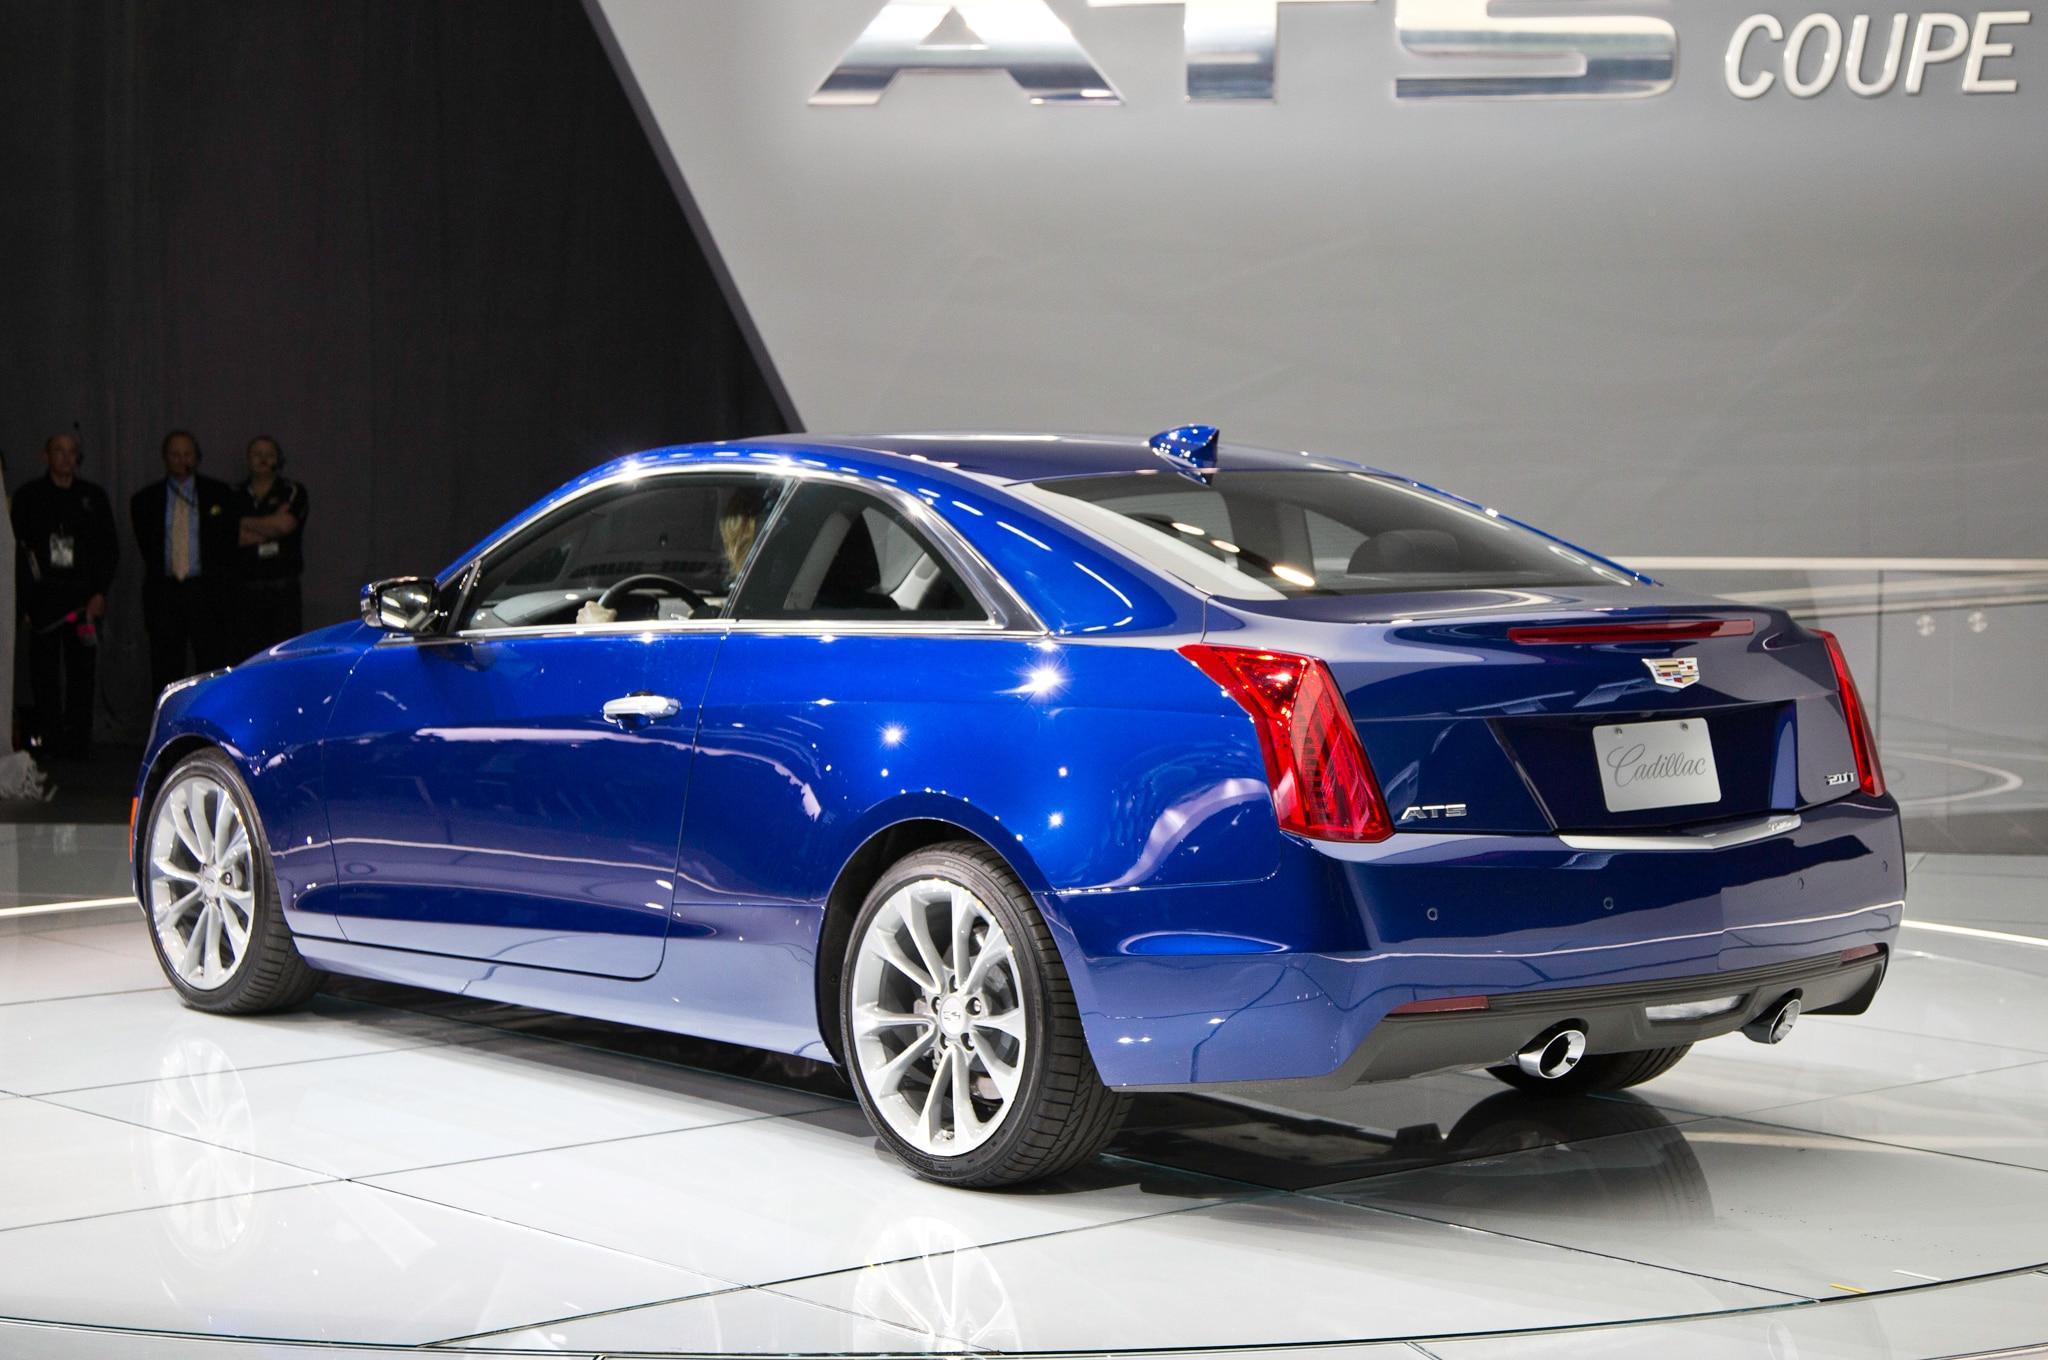 2015 Cadillac ATS Coupe Debuts At 2014 Detroit Auto Show